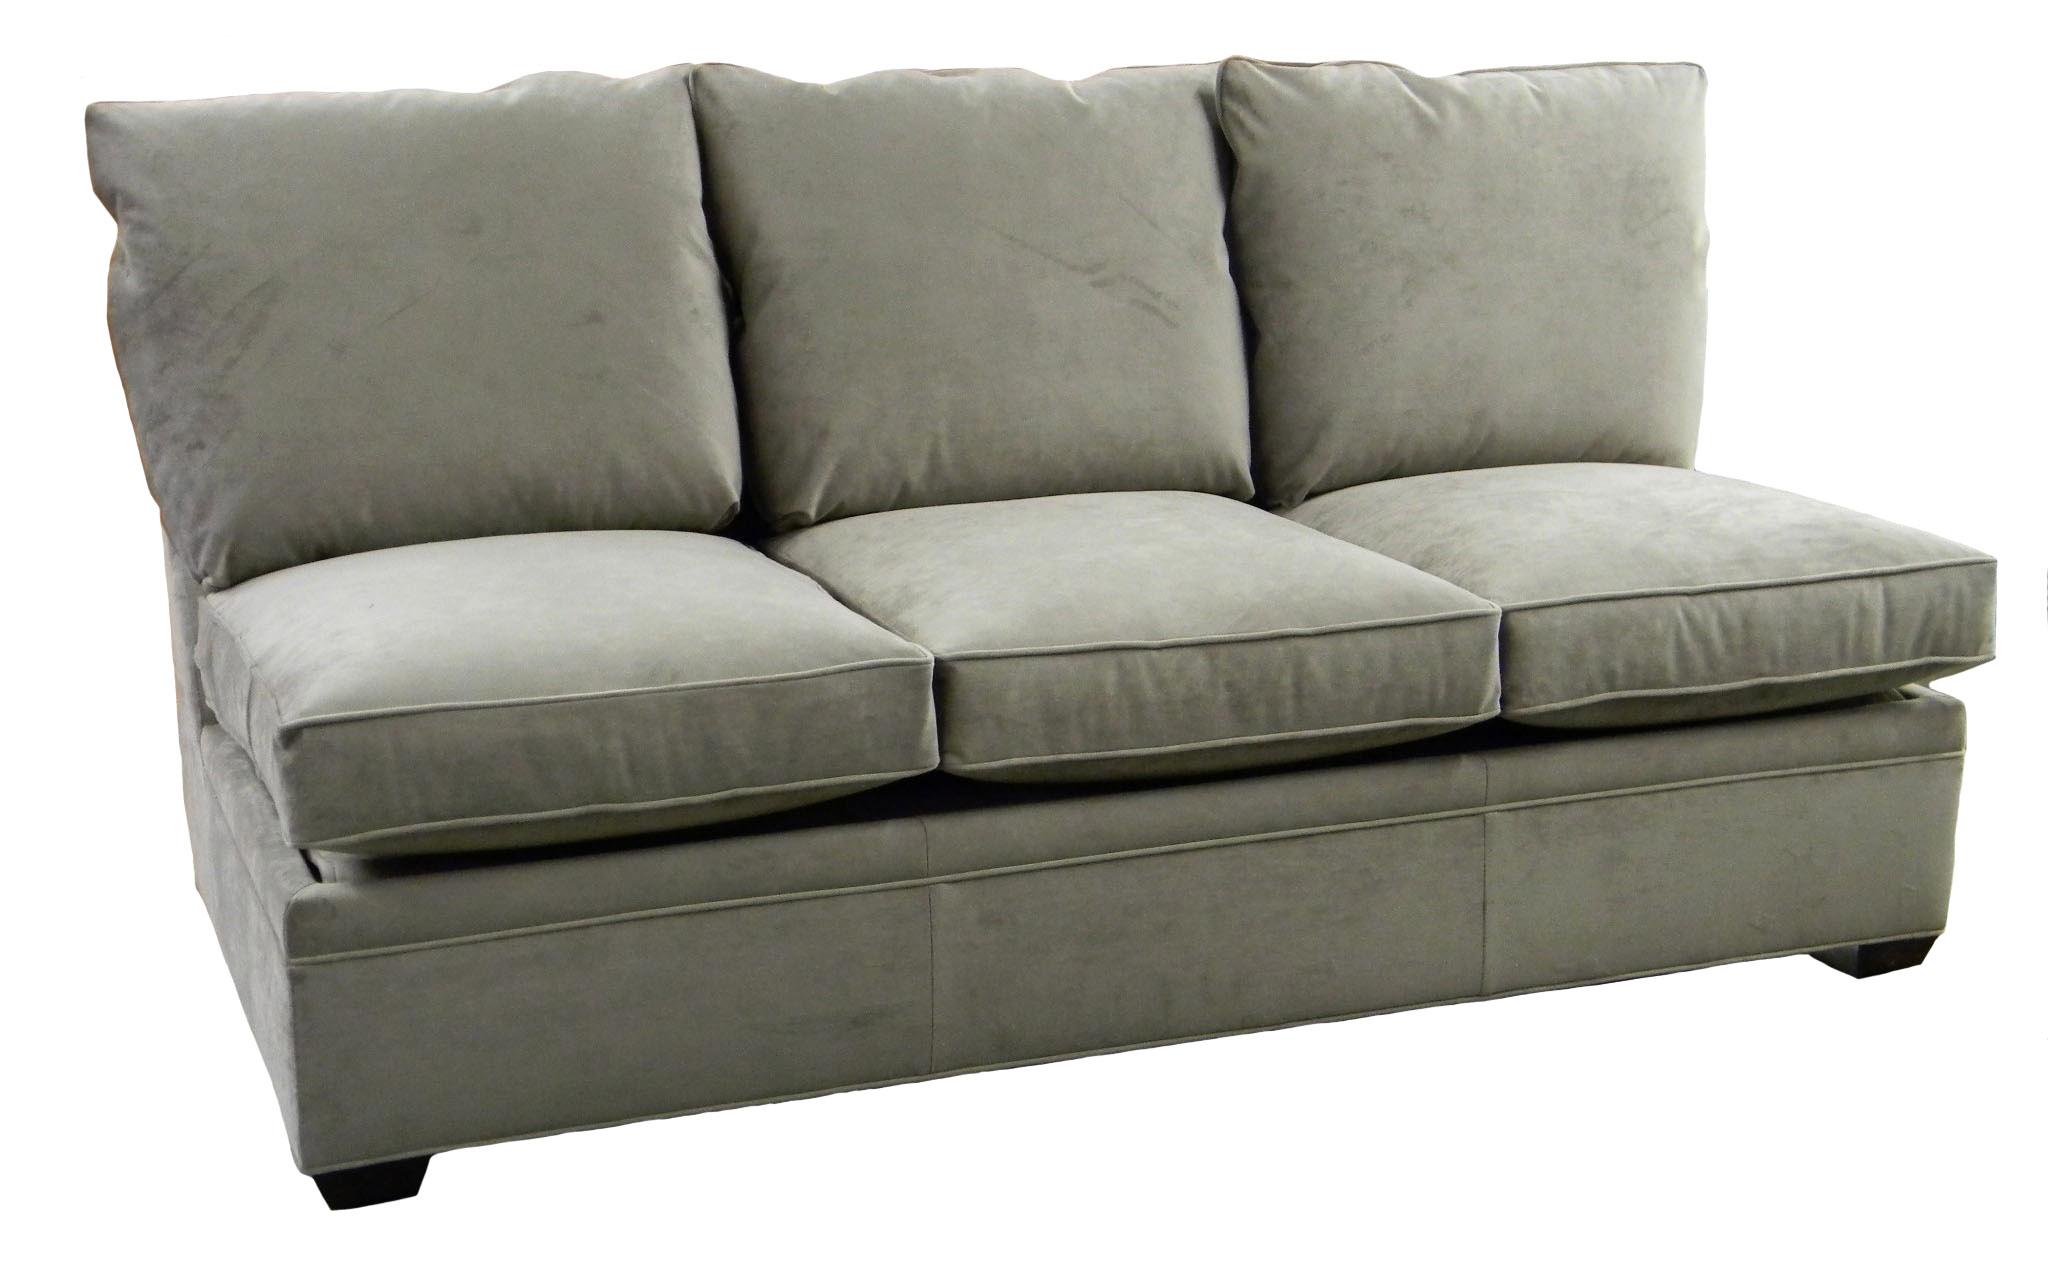 Byron Sectional Armless Queen Sleeper Sofa Air Mattress Carolina Chair North Carolina American Usa Furniture Custom